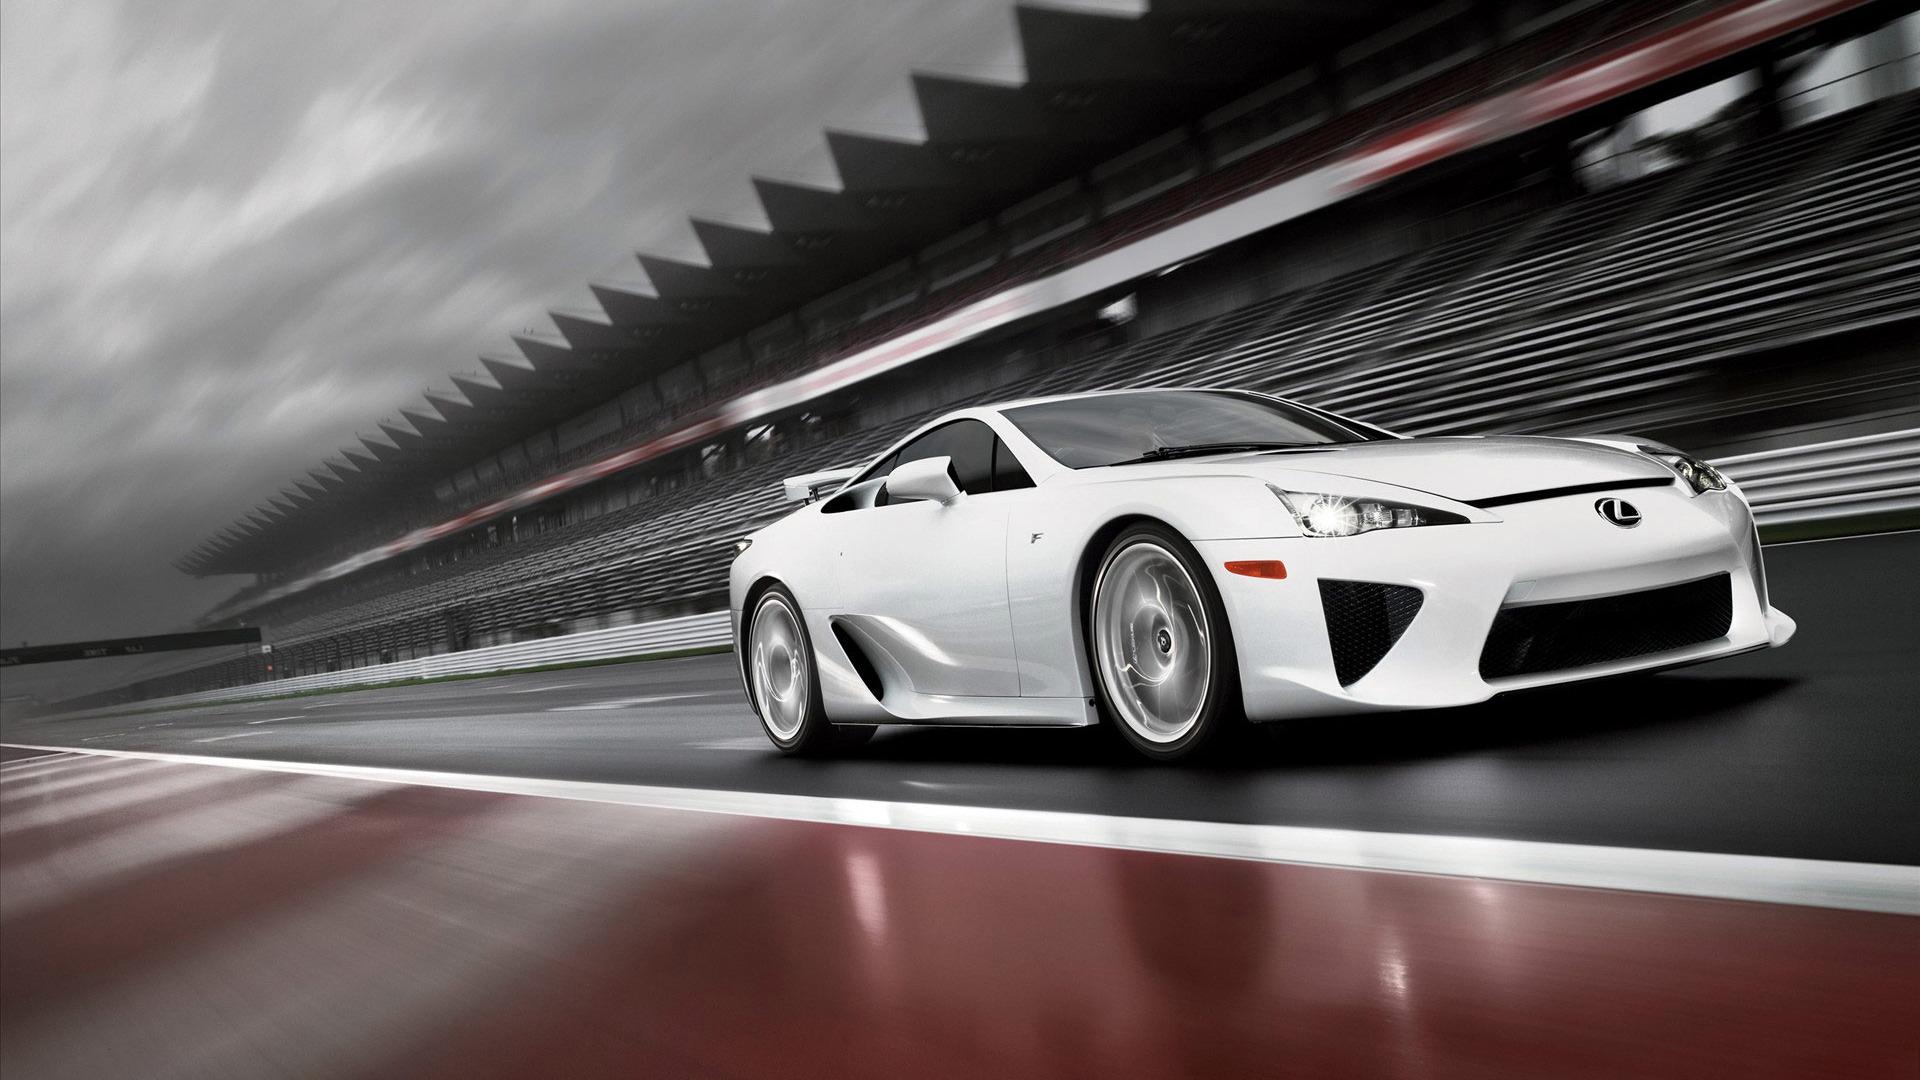 Lexus Lfa Wallpaper Lexus Cars Wallpapers In Jpg Format For Free